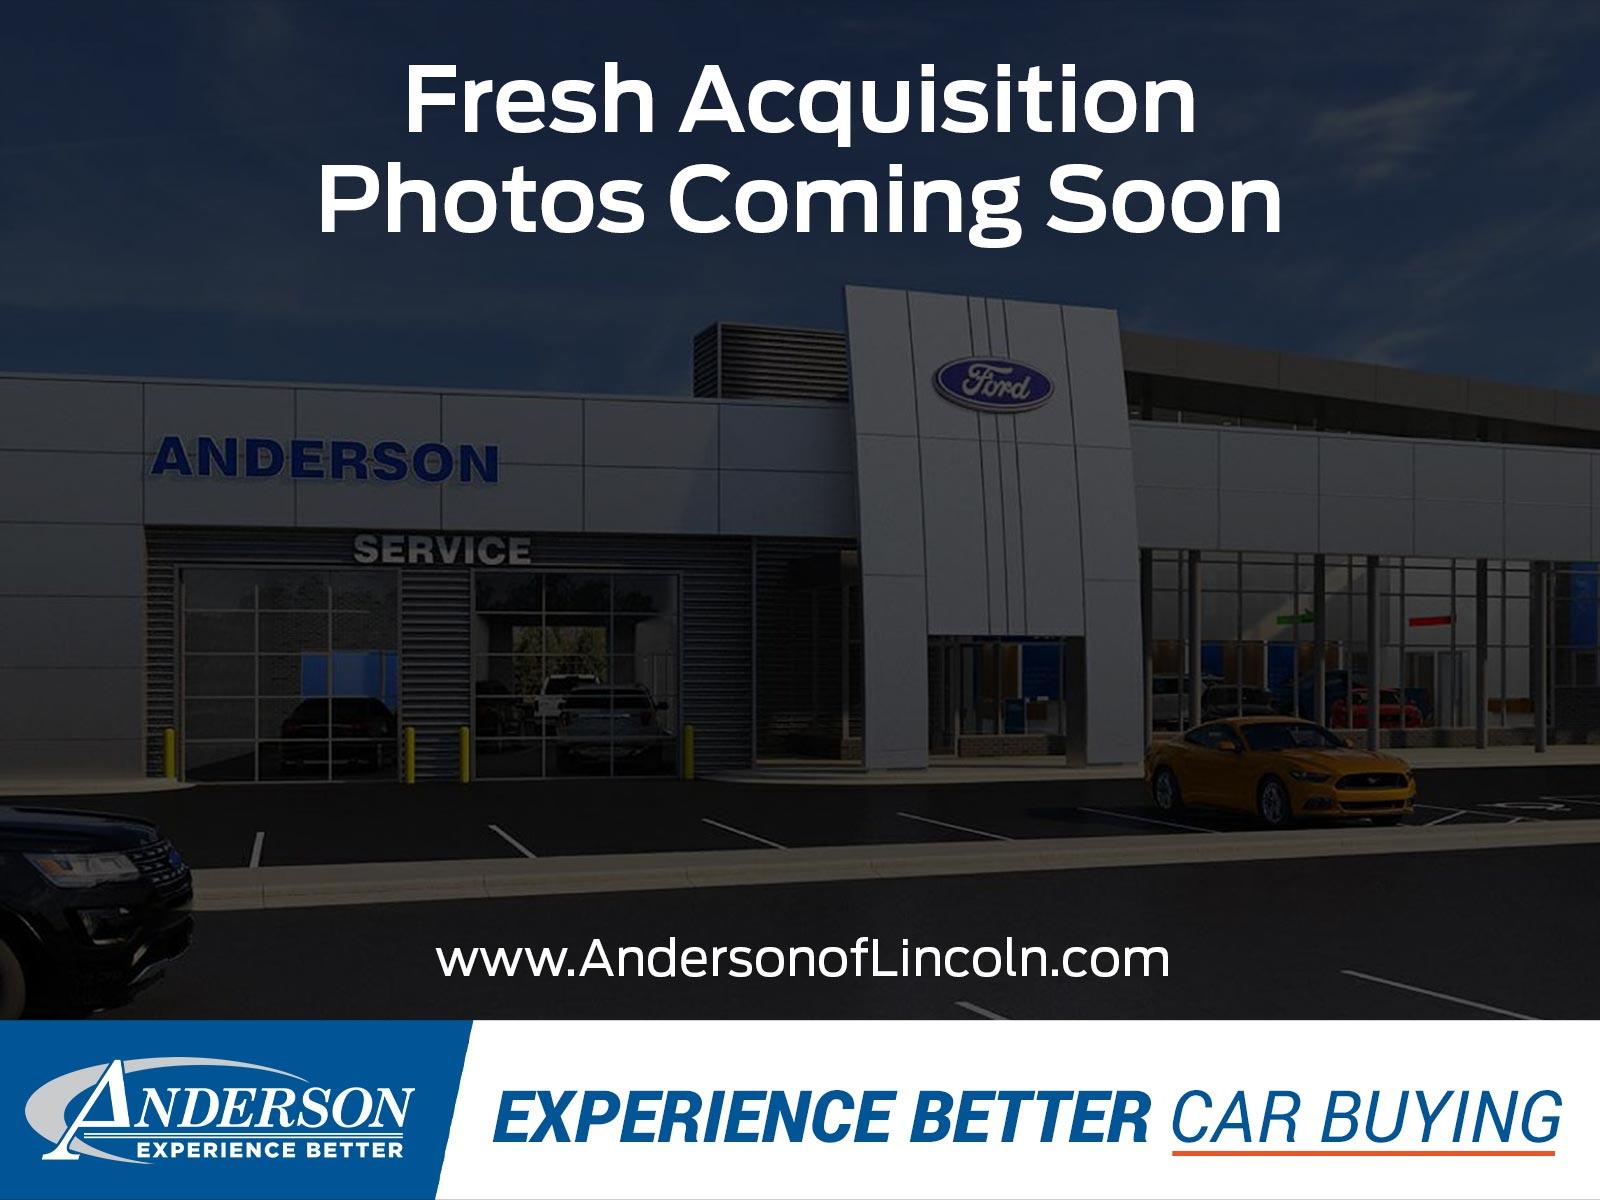 Used 2018 Ford Super Duty F-250 SRW Lariat Crew Cab Pickup for sale in Lincoln NE